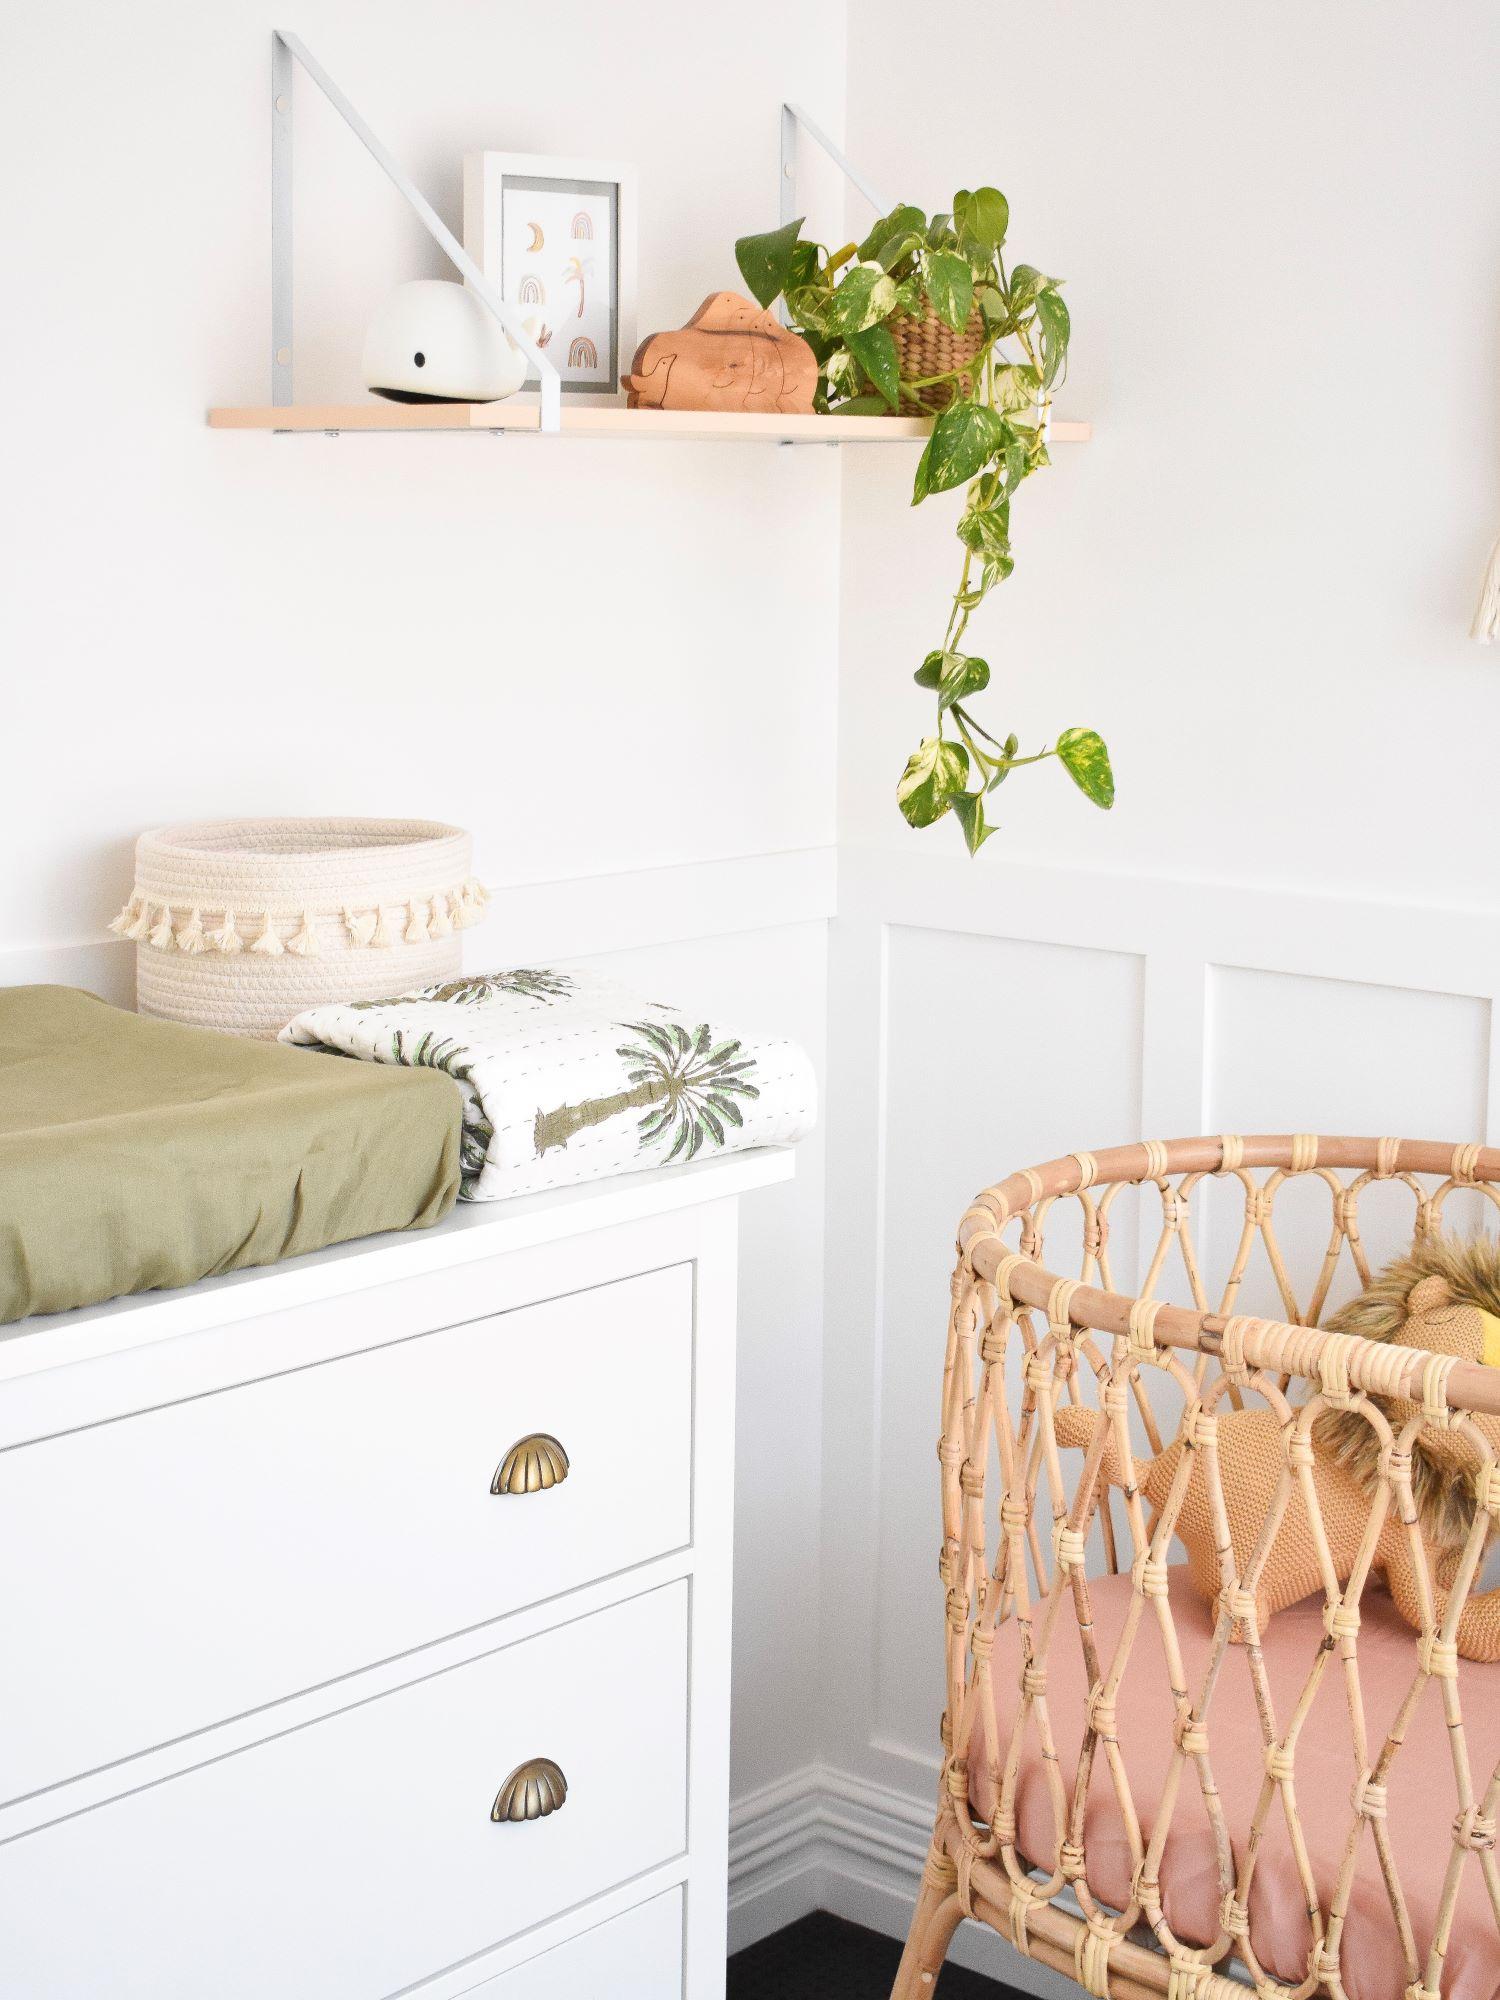 My Kind of Bliss Coastal Interior Renovation Baby Room